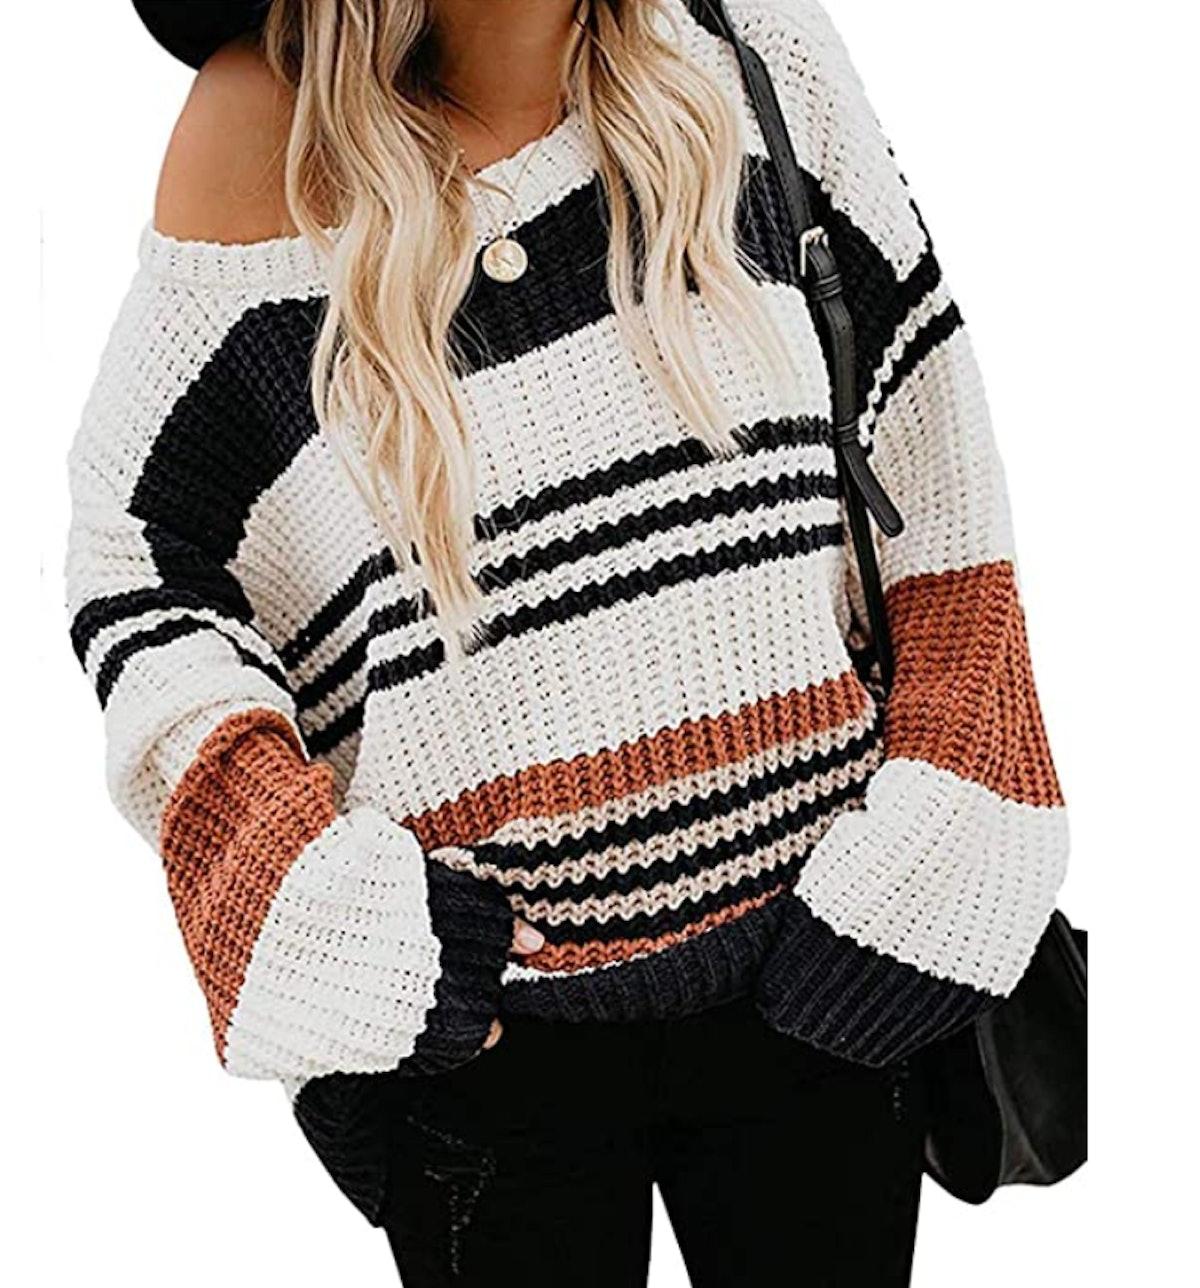 ZESICA Pullover Sweater